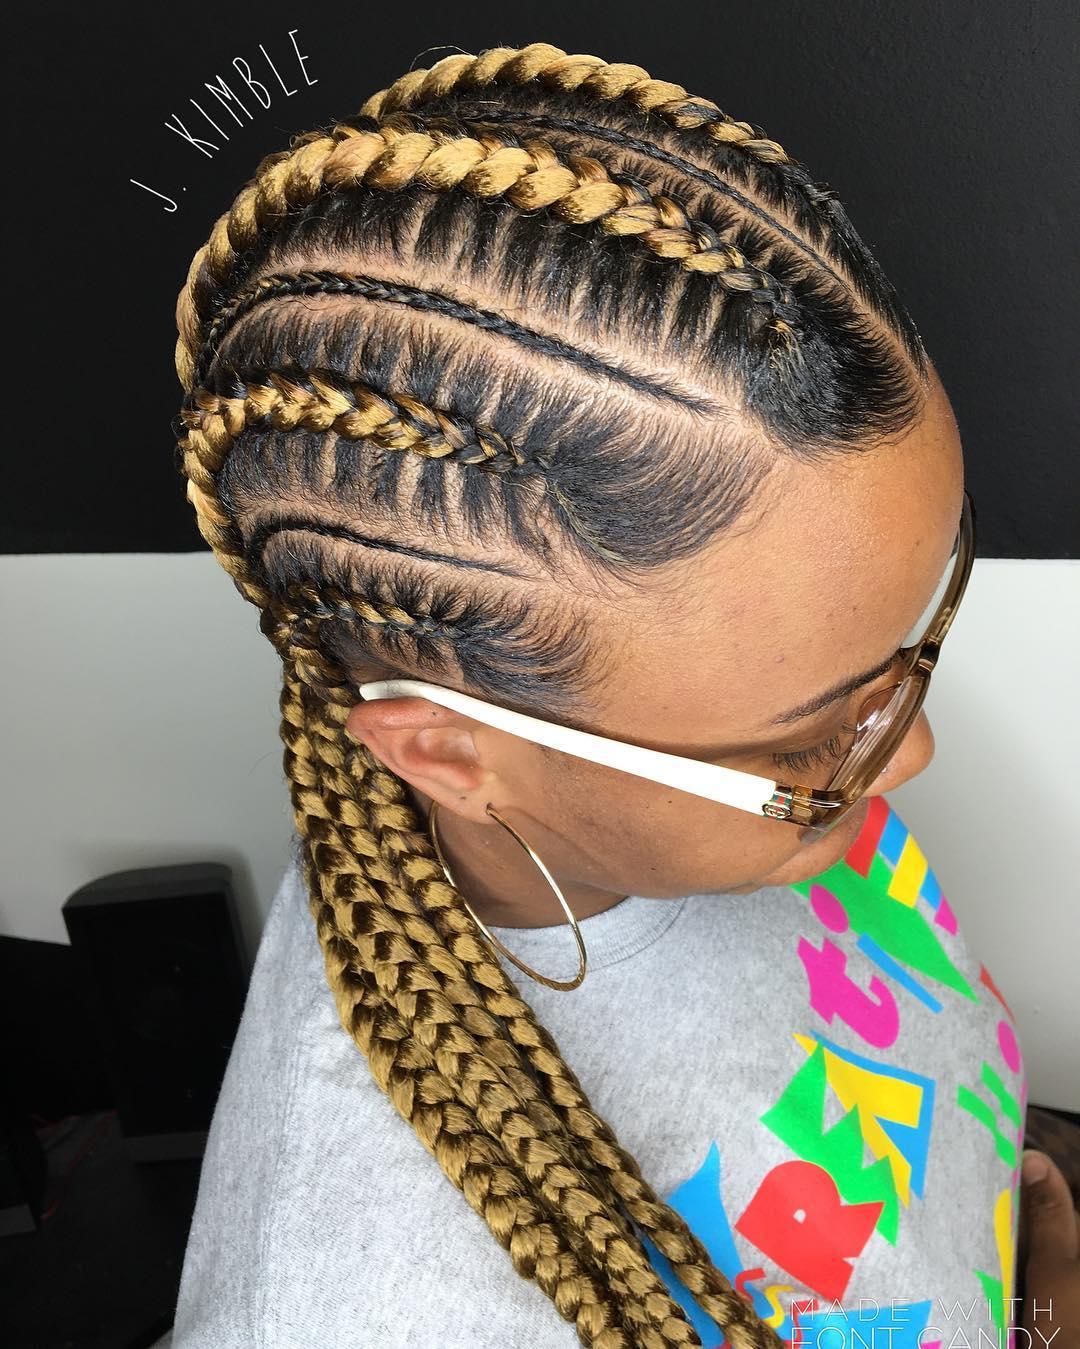 Remarkable 70 Best Black Braided Hairstyles That Turn Heads In 2017 Short Hairstyles Gunalazisus